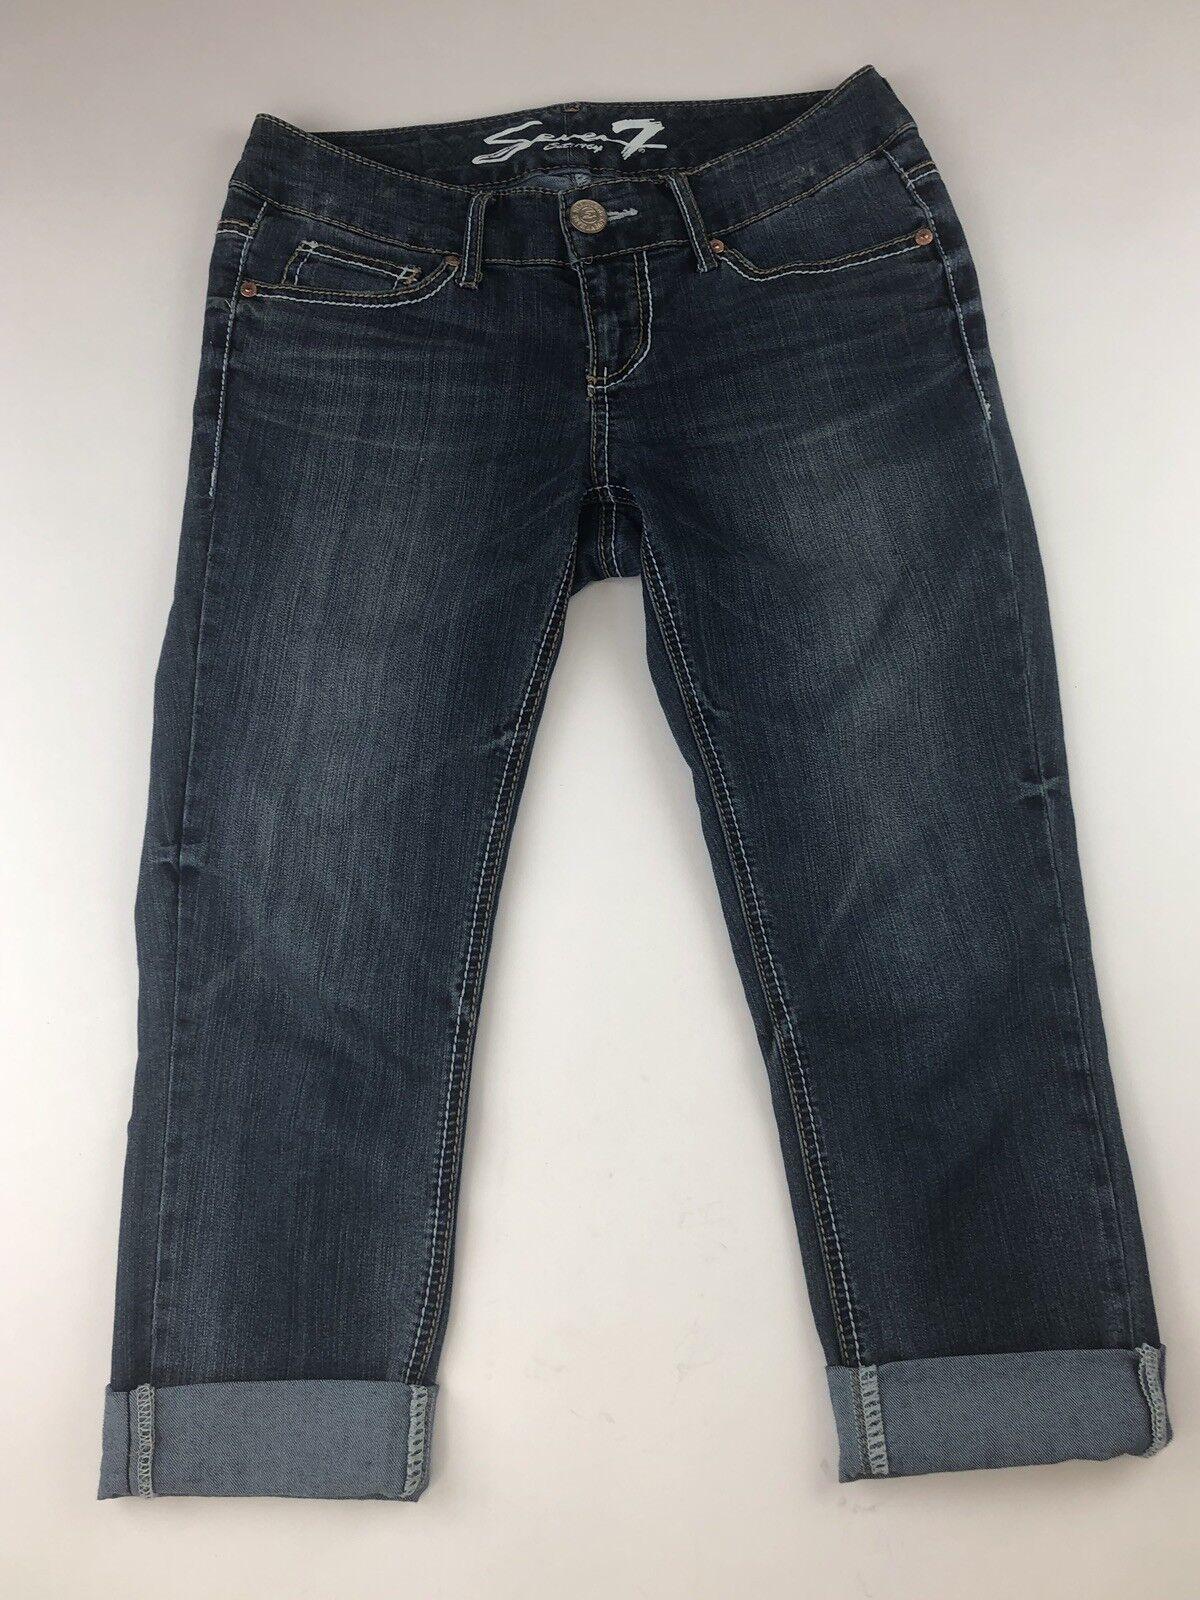 7 Seven For All Mankind Womens Boyfriend Jeans Size 6 EUC